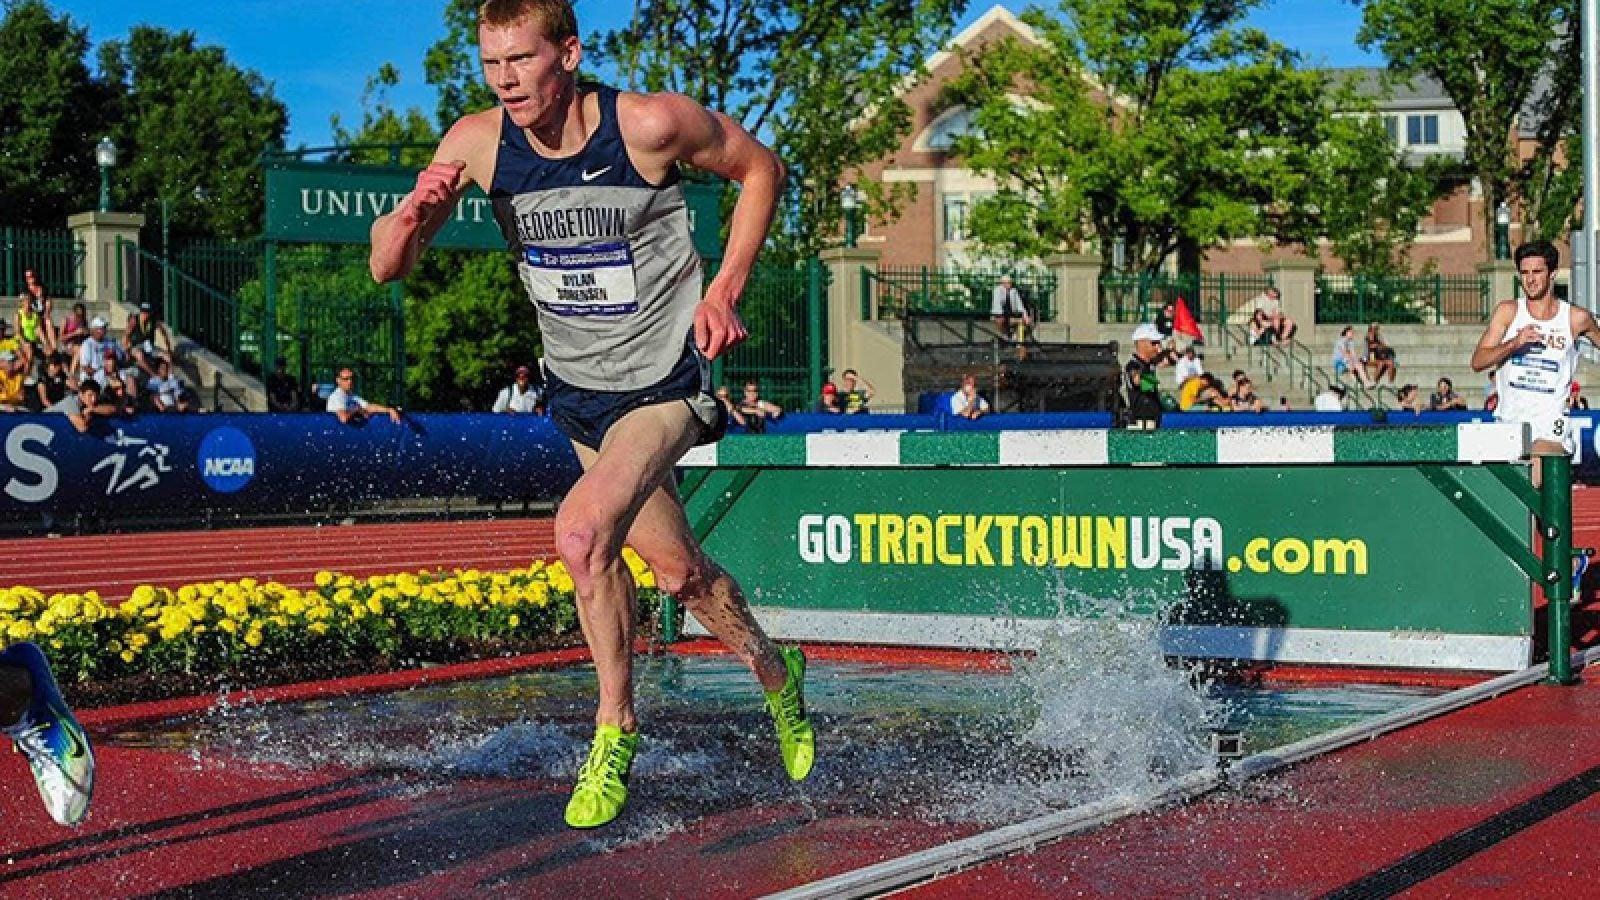 Dylan Sorensen runs on a track outside. Photograph by Michael Scott